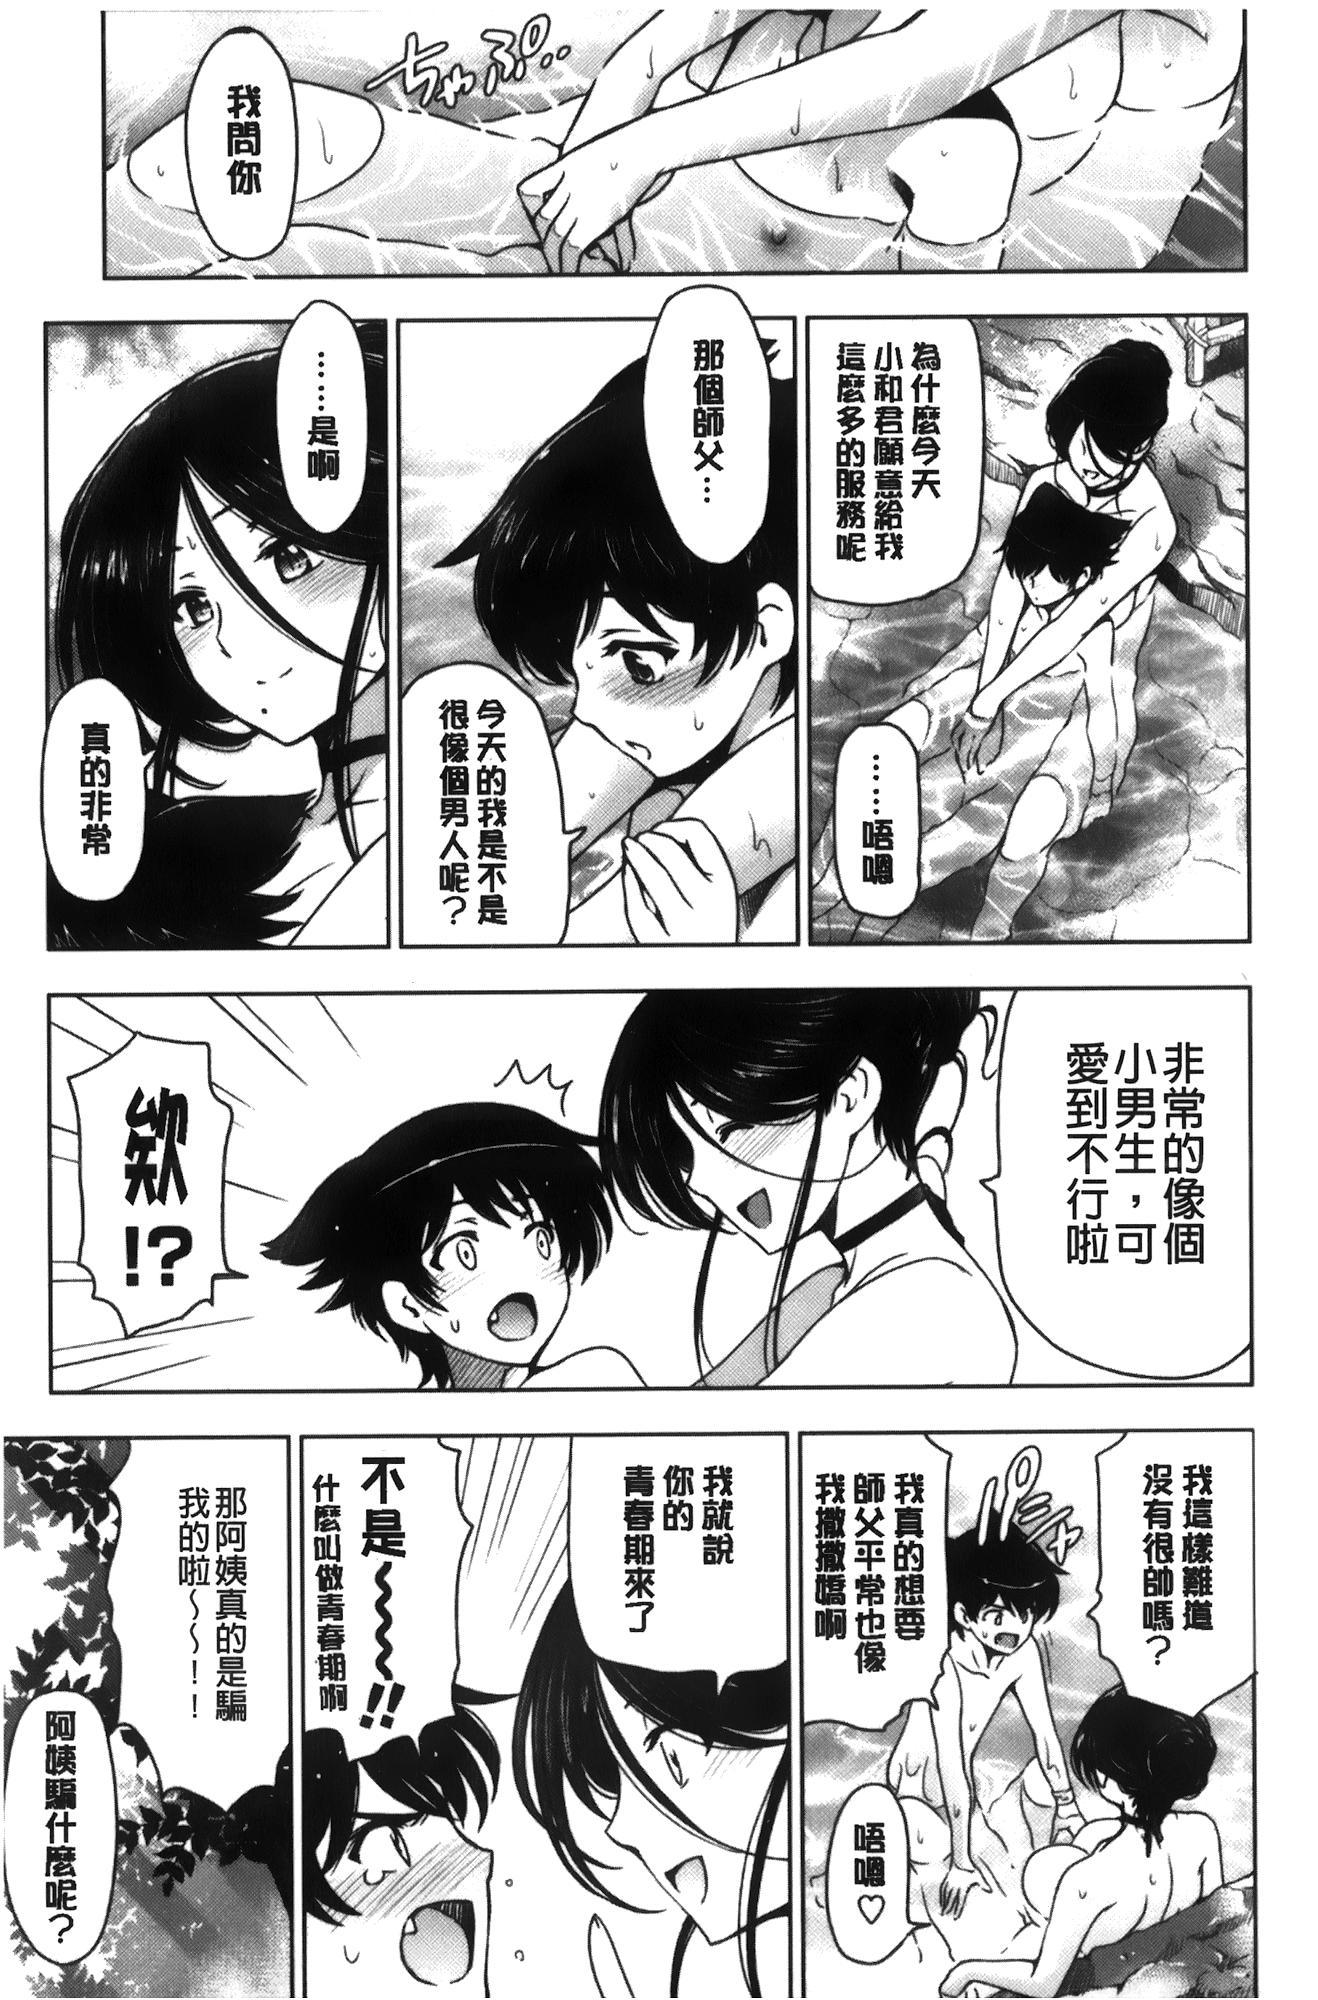 Majo × Shota ~ Genteiban | 魔女X小正太 限定版 149